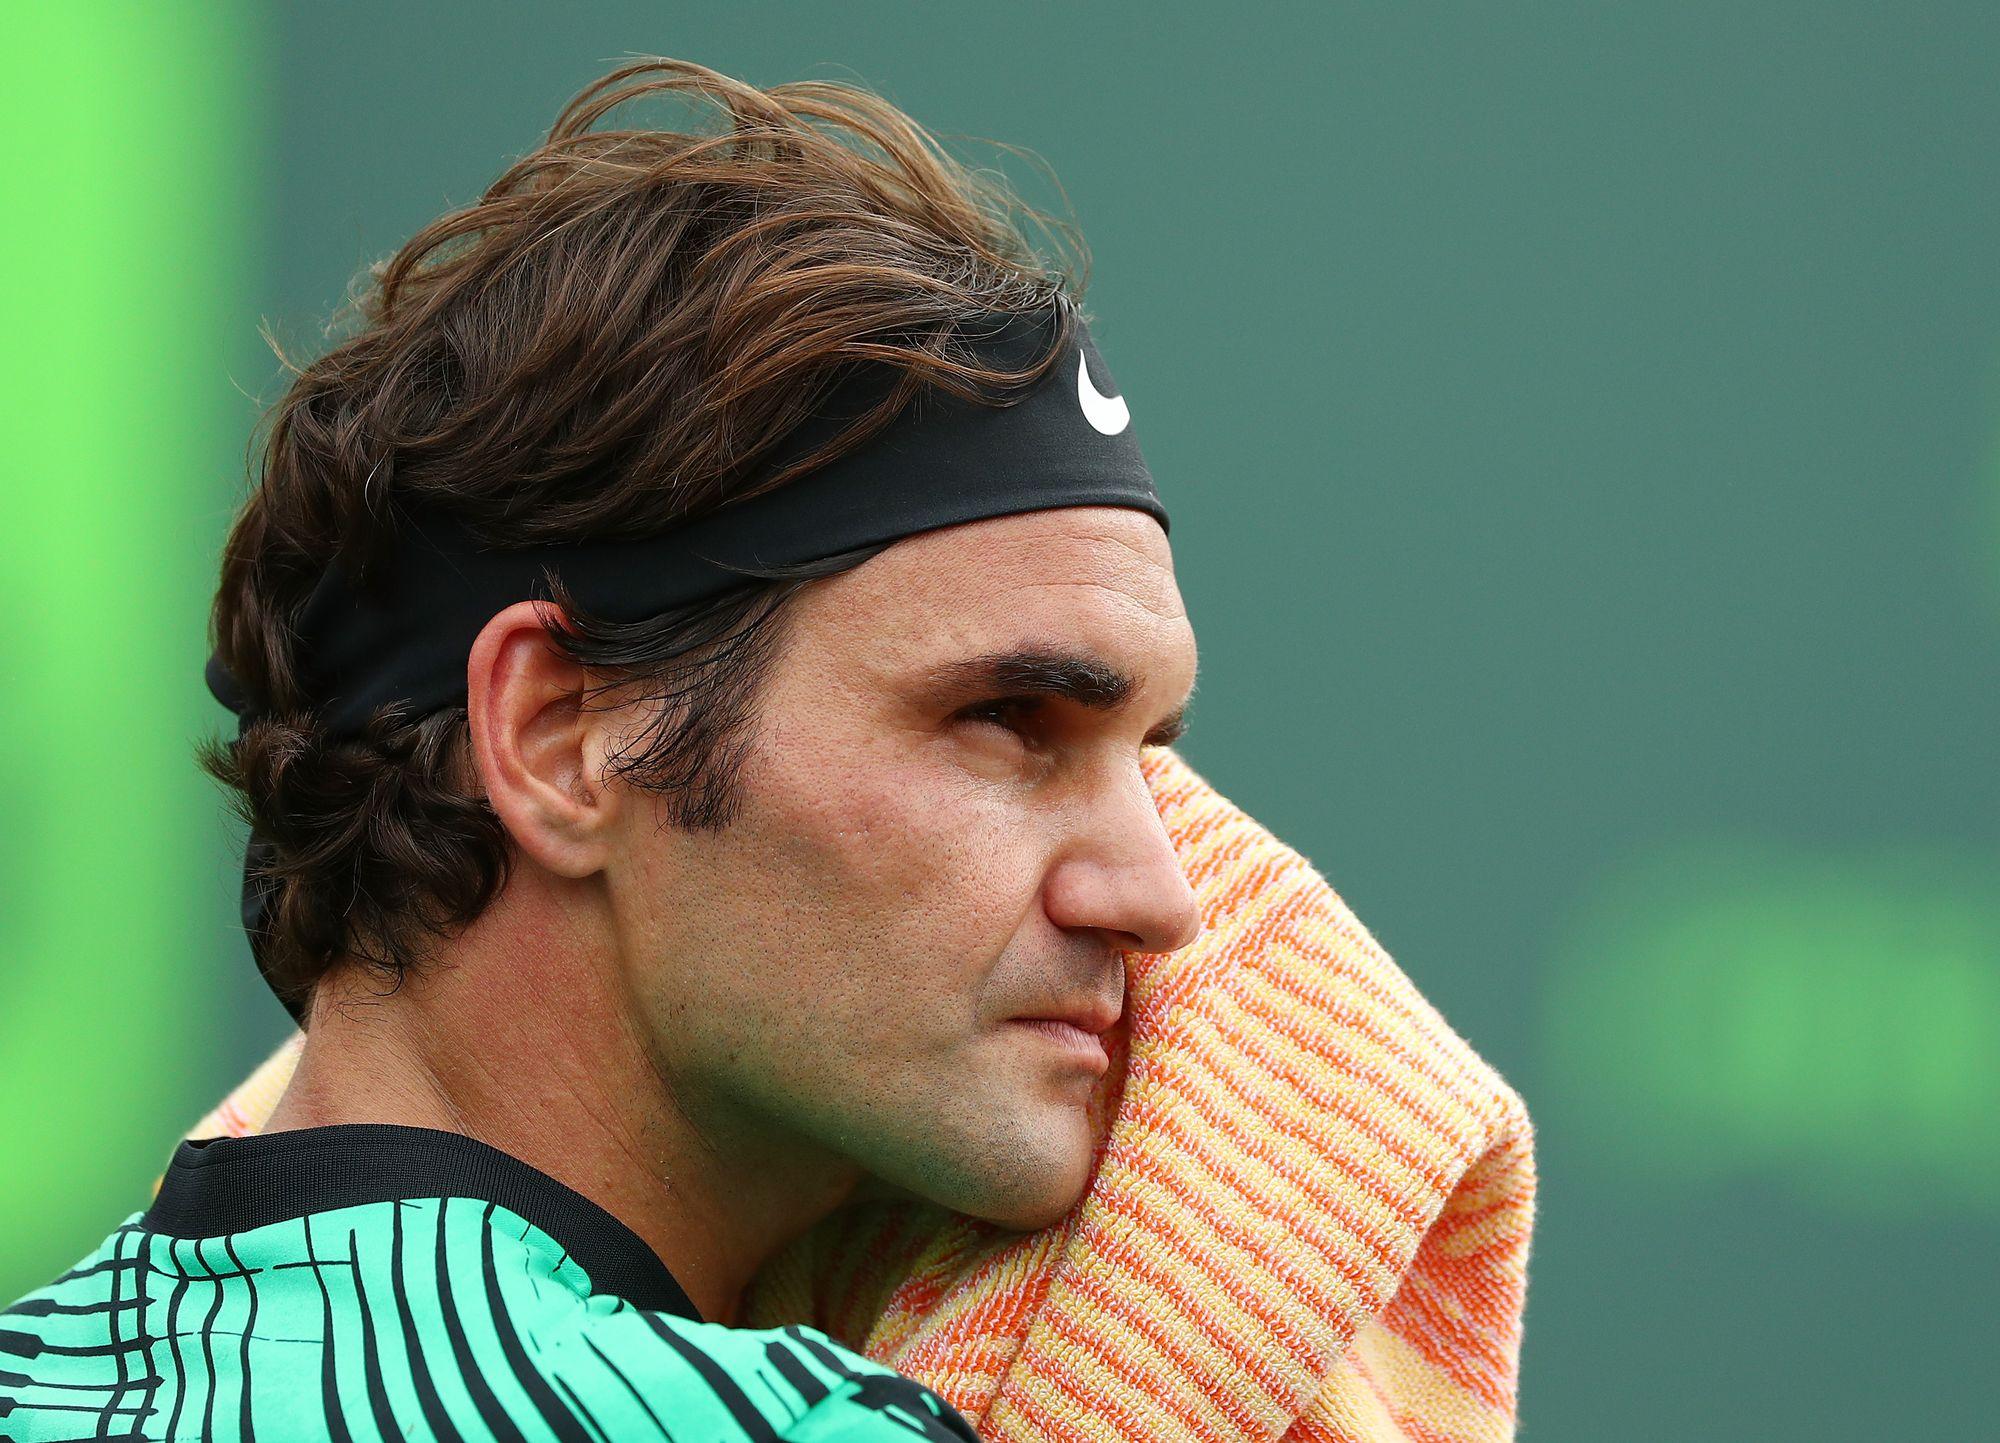 Federer-Kyrgios, explosif choc des générations à Miami — Tennis